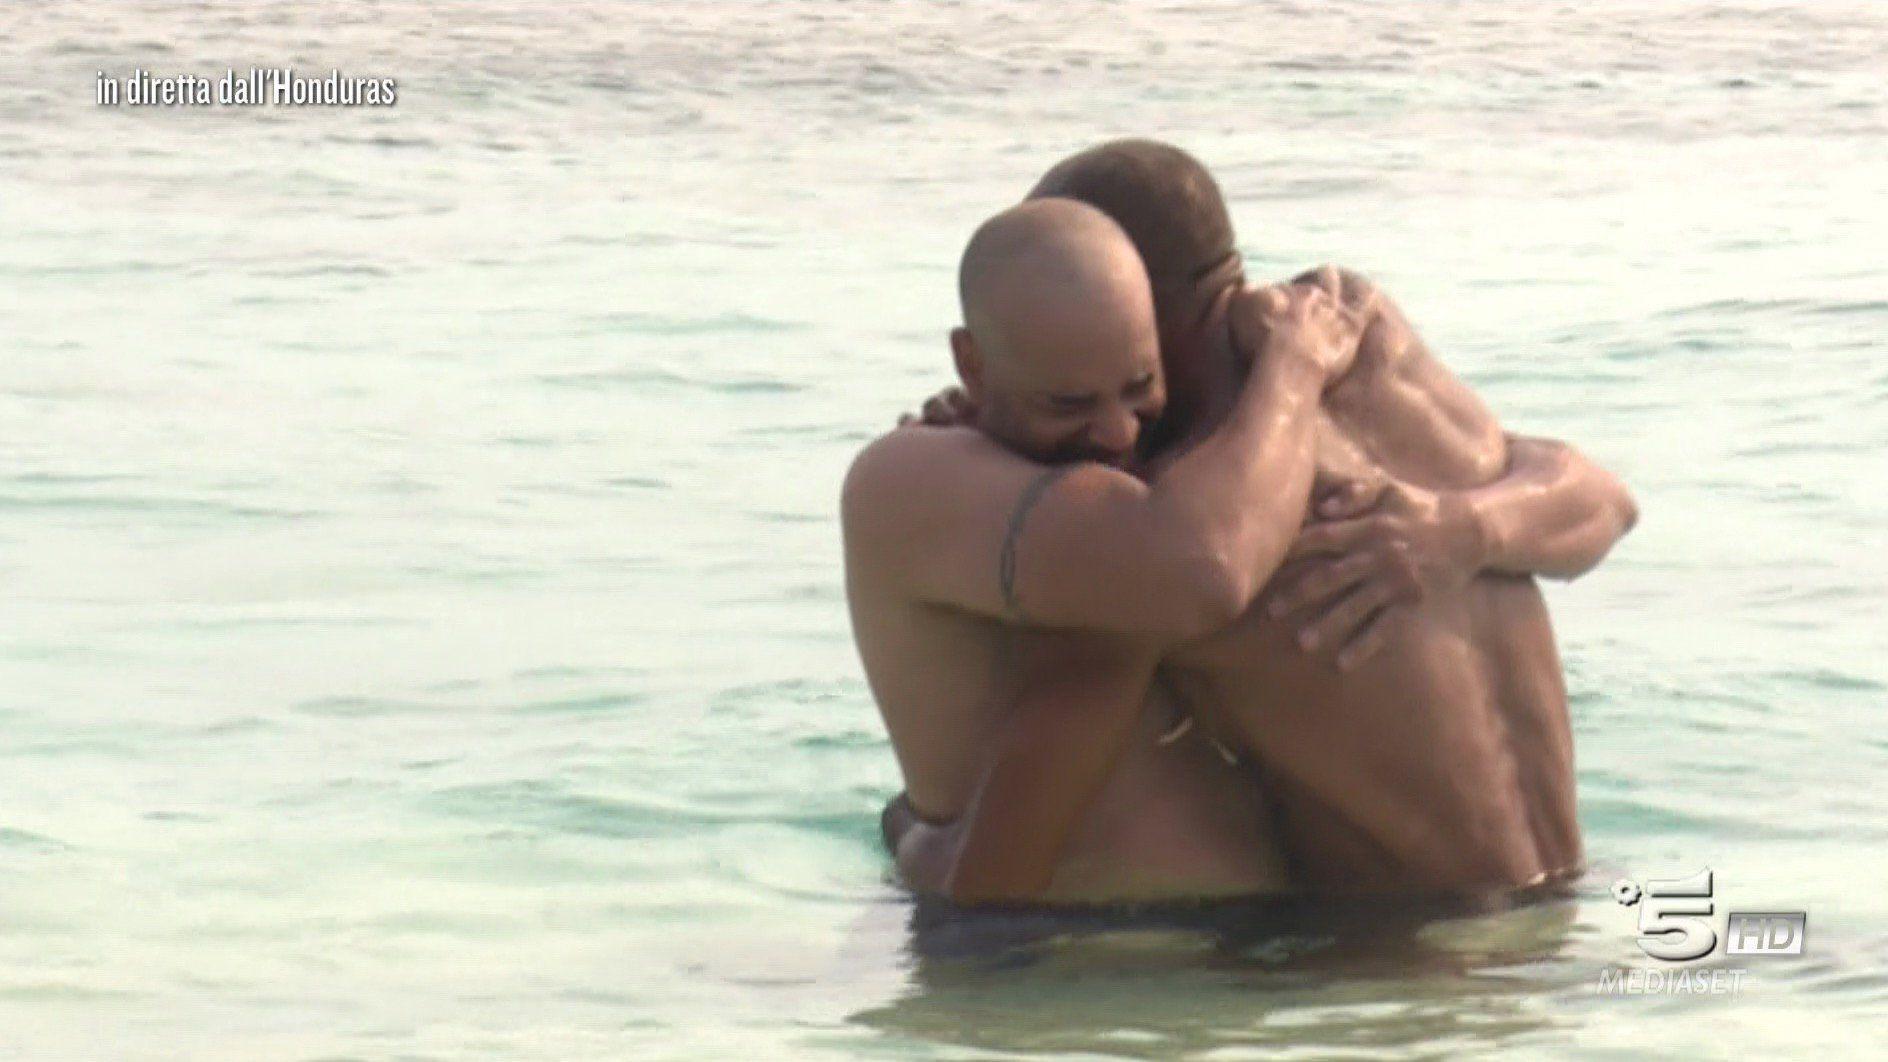 amaurys incontra il fratello a l'isola dei famosi 2018